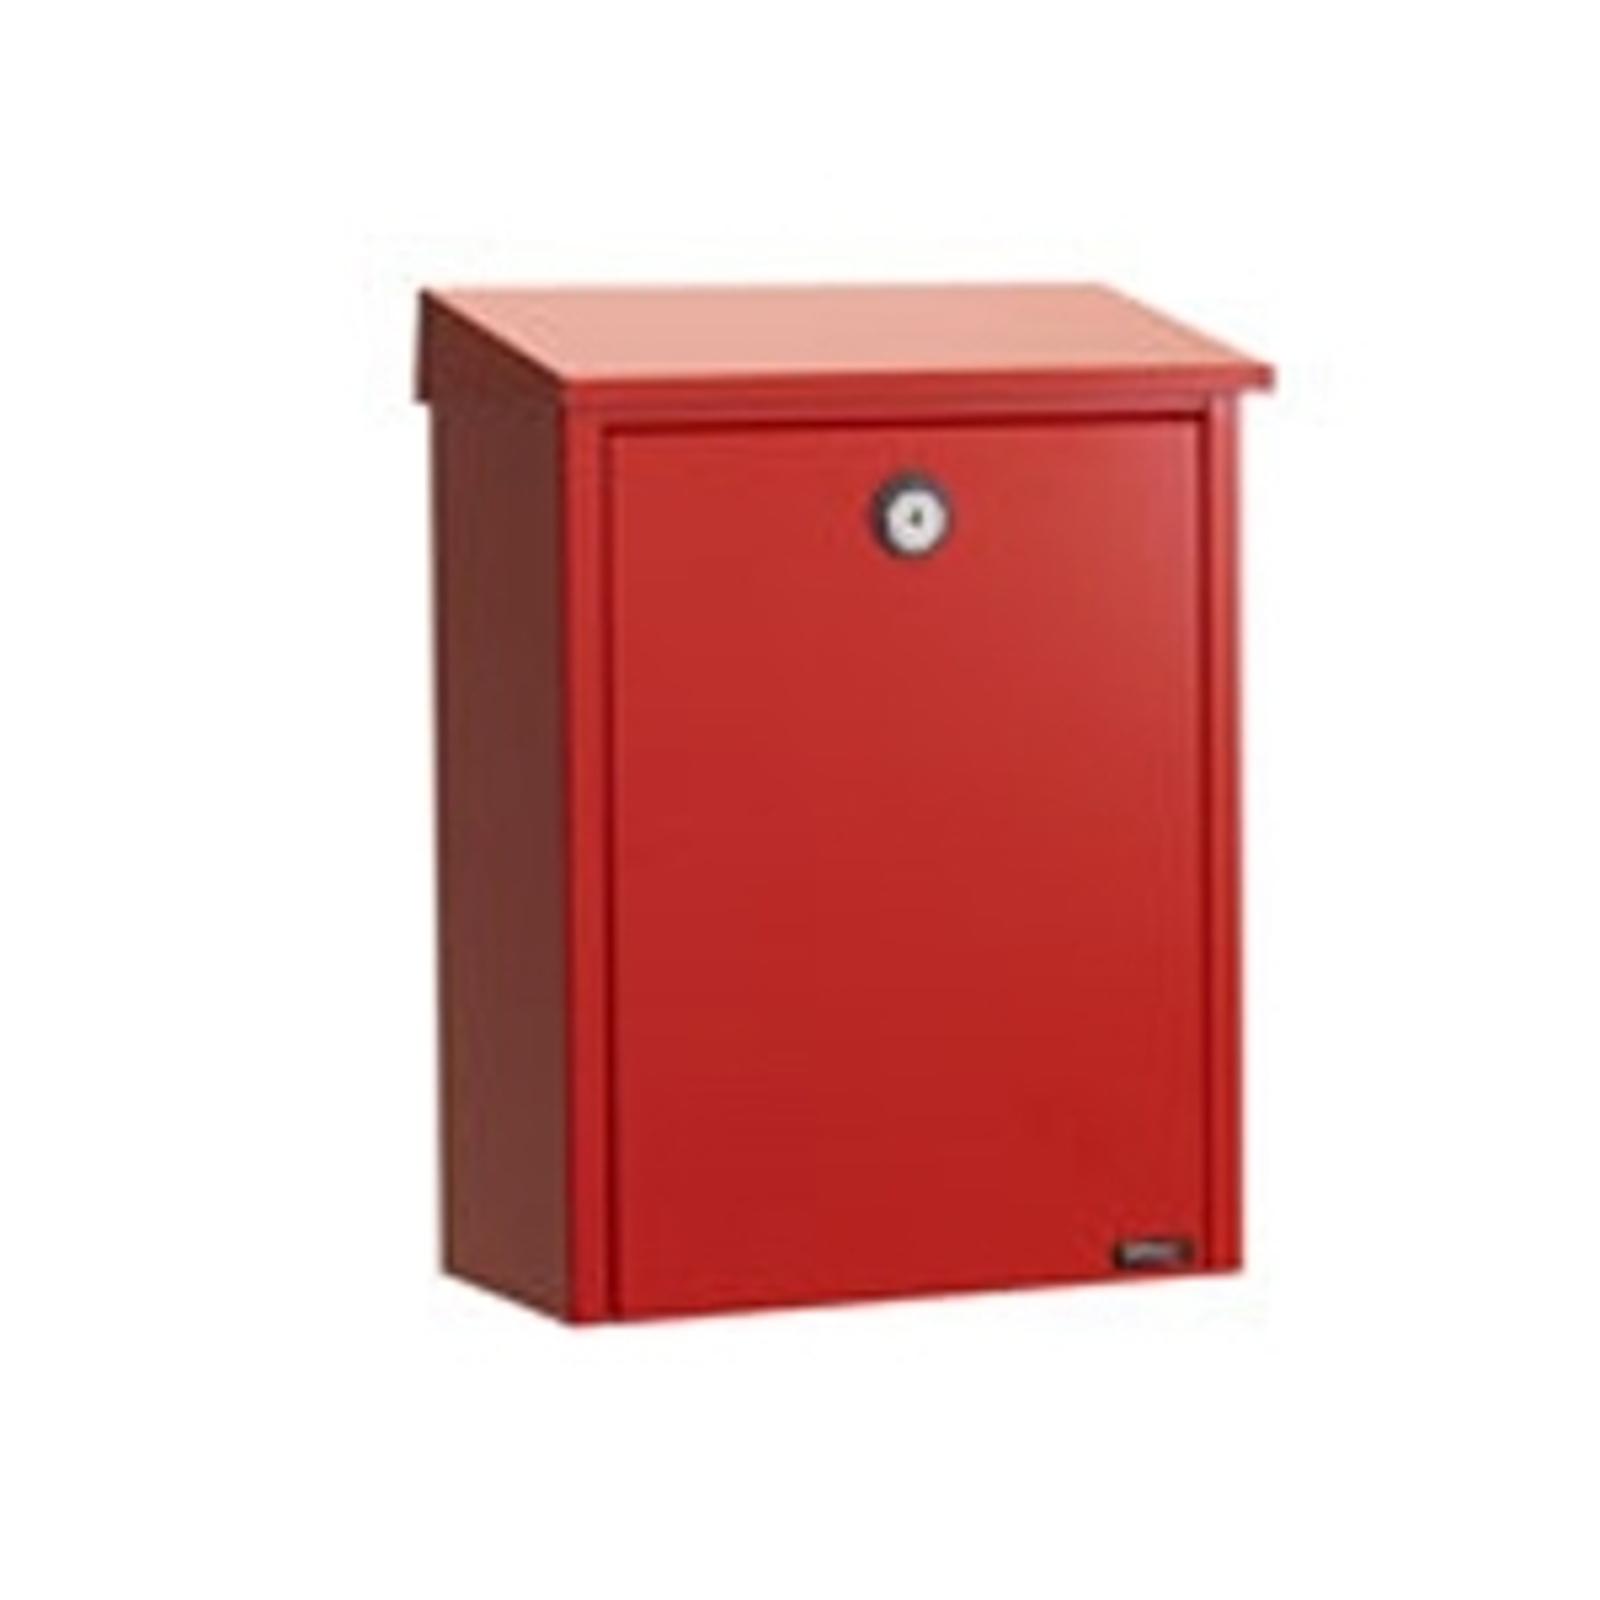 Enkel postlåda av stålplåt, röd